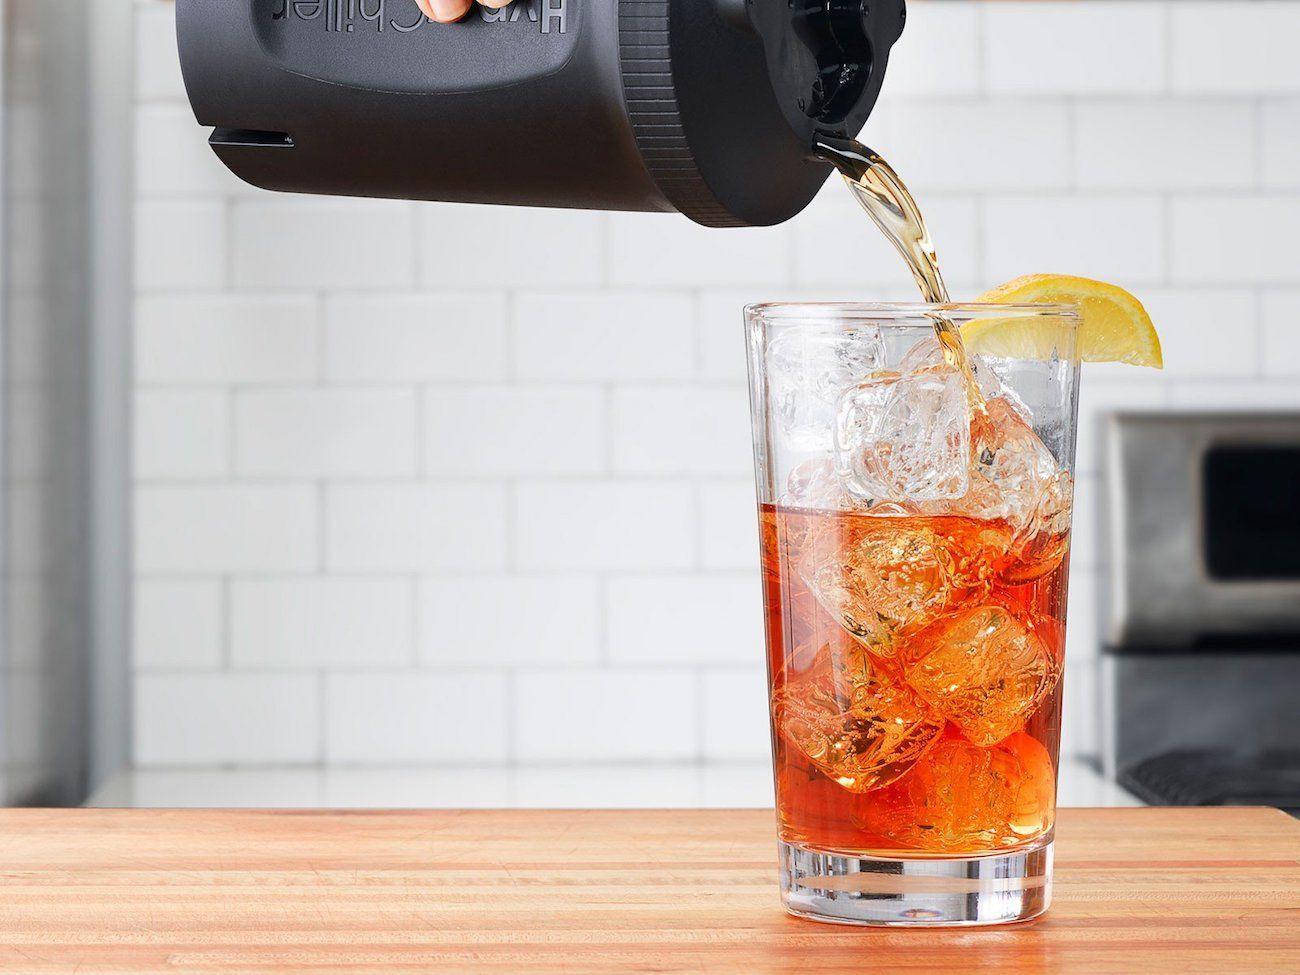 HyperChiller Instant Iced Coffee Maker